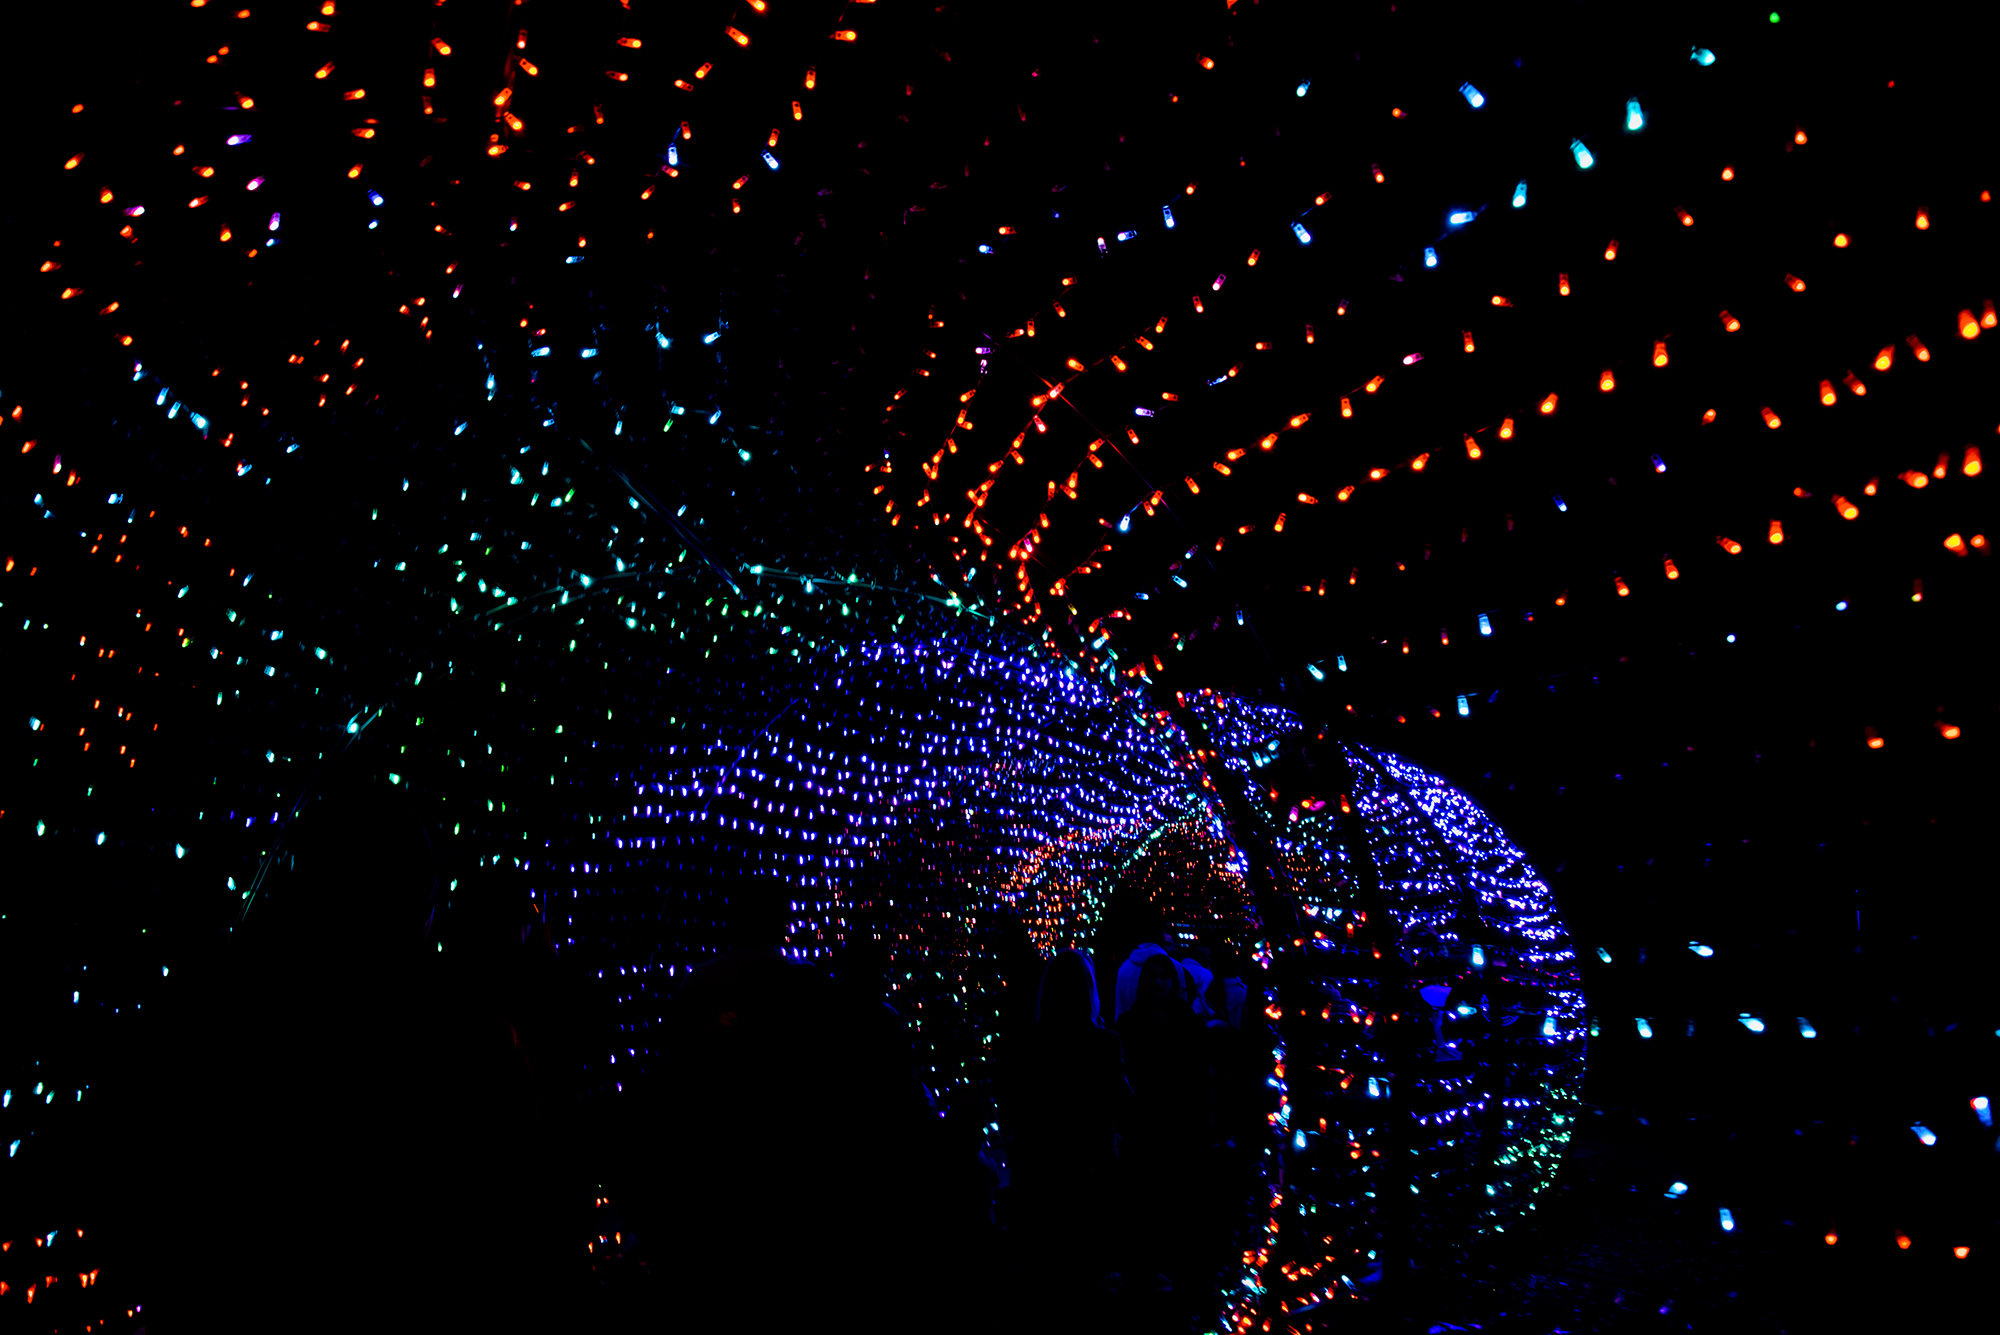 zoolights1_1low.jpg